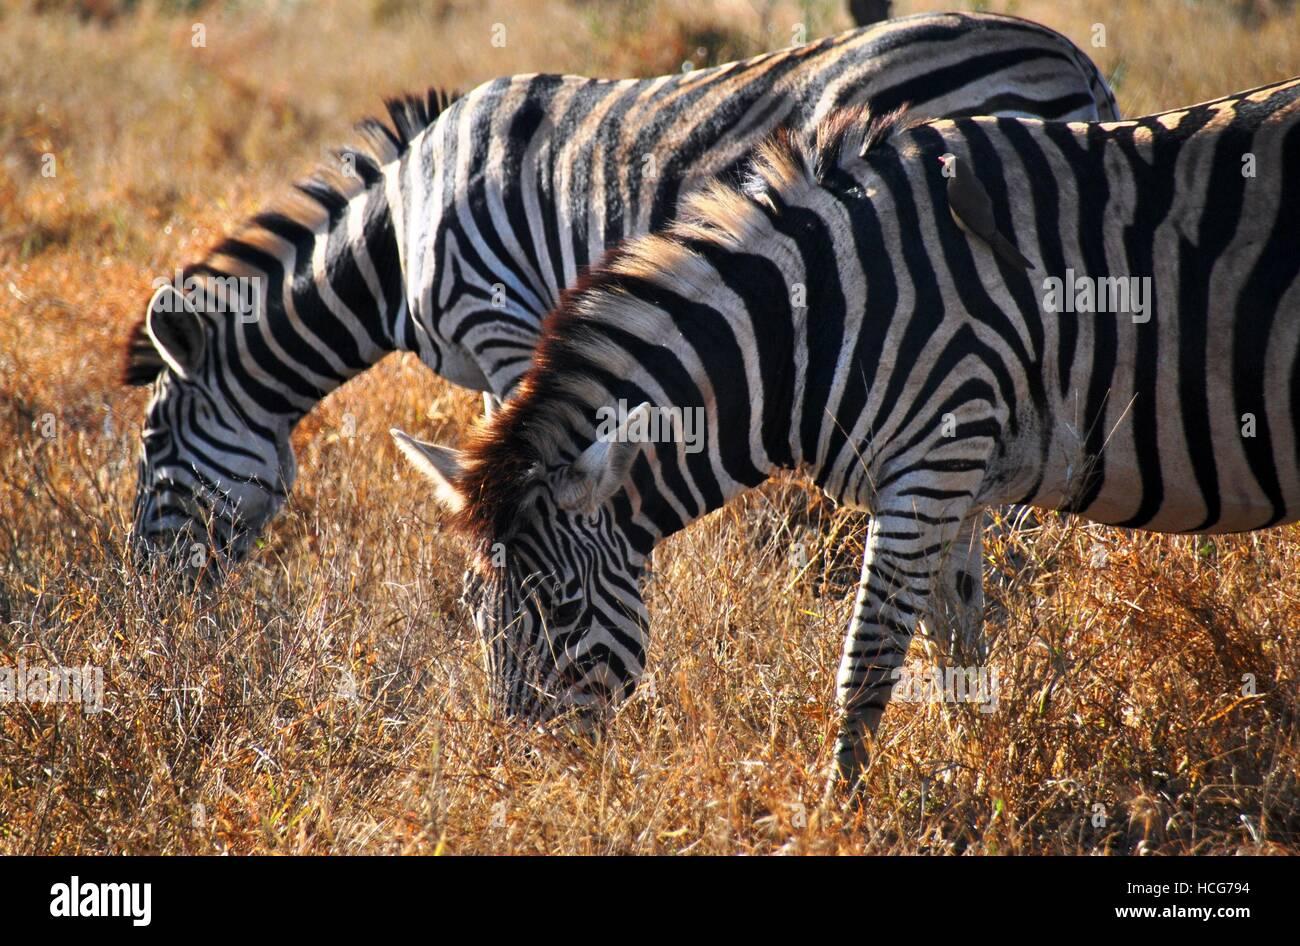 African Zebras grazing in Kruger National Park - Stock Image